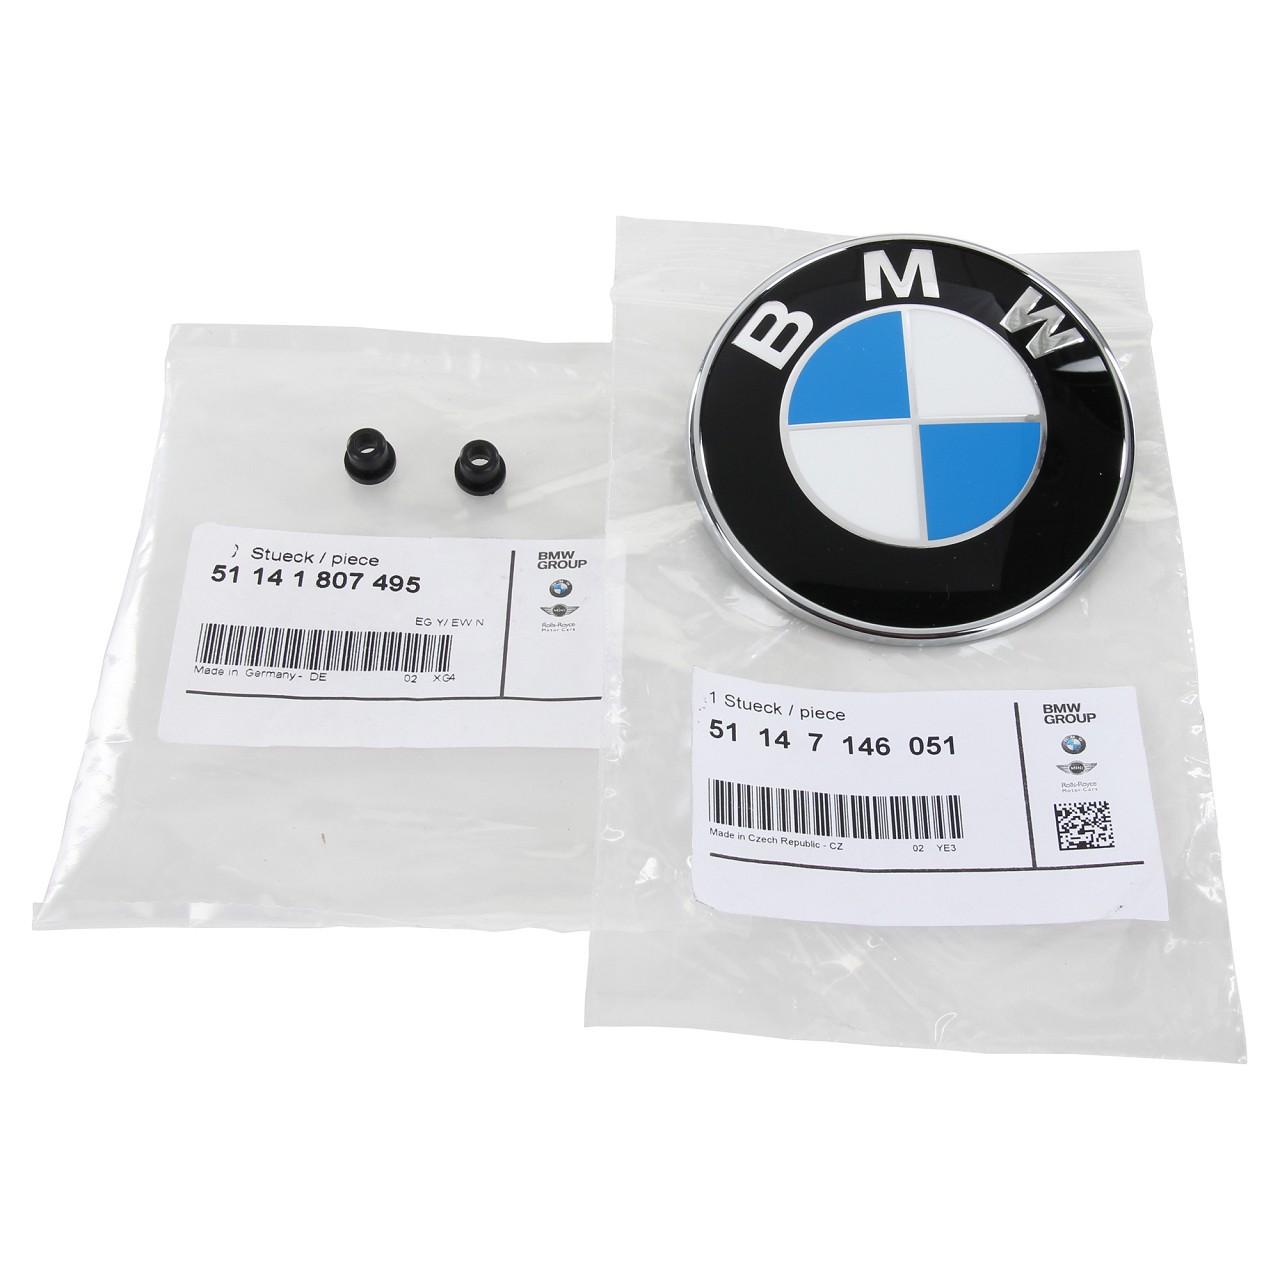 ORIGINAL BMW Emblem Plakette Heckklappe + 2x Tülle Befestigung für 3er COUPE E92